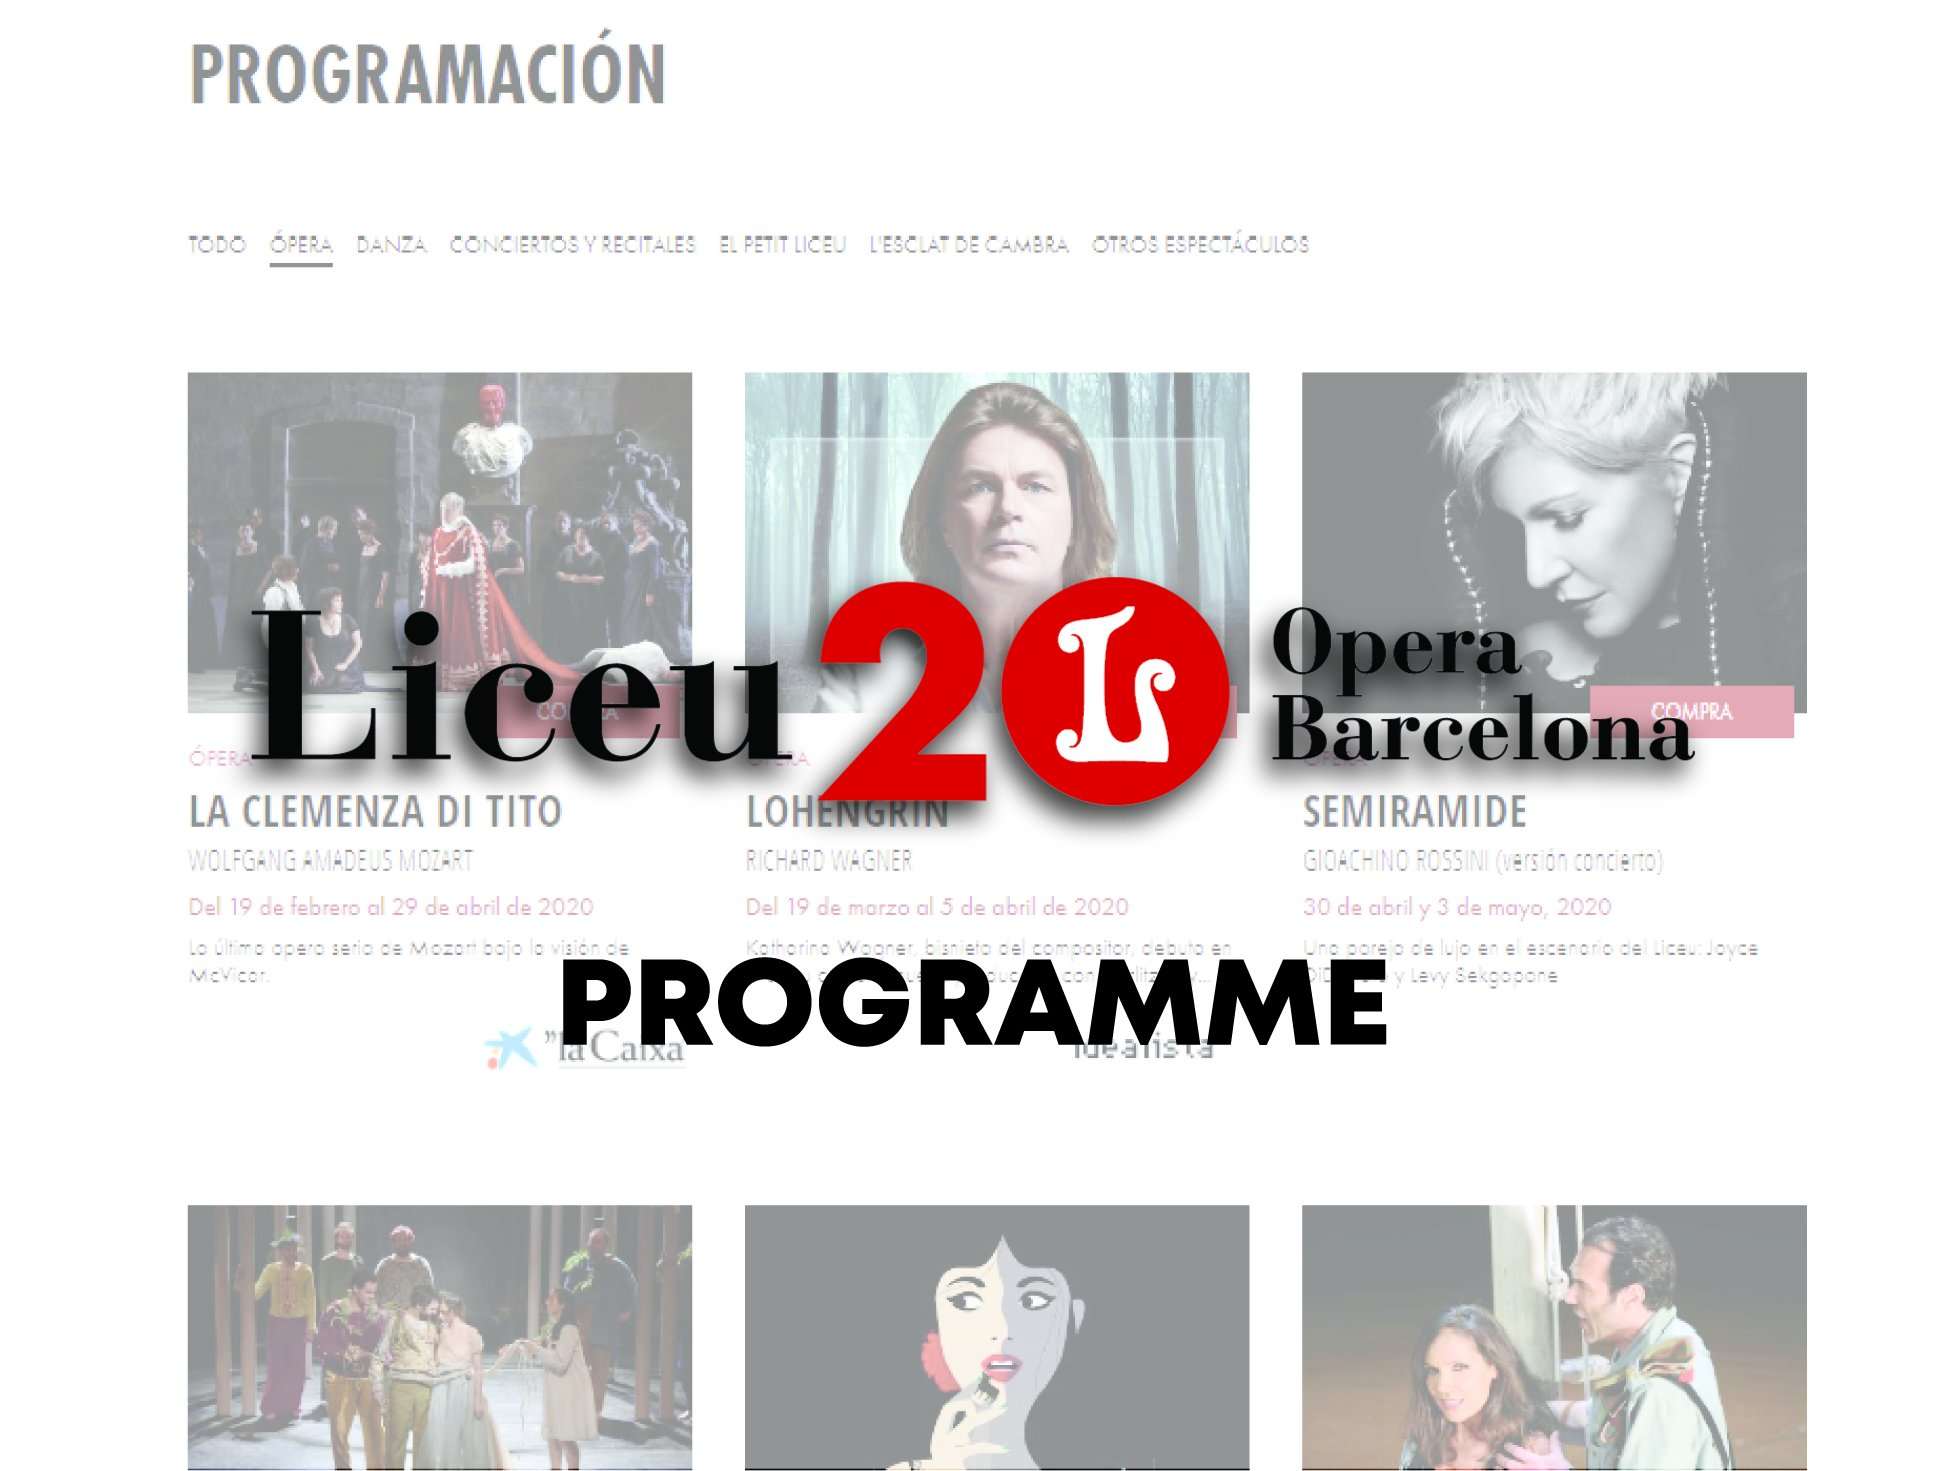 Link Liceu Opera Barcelona Programme